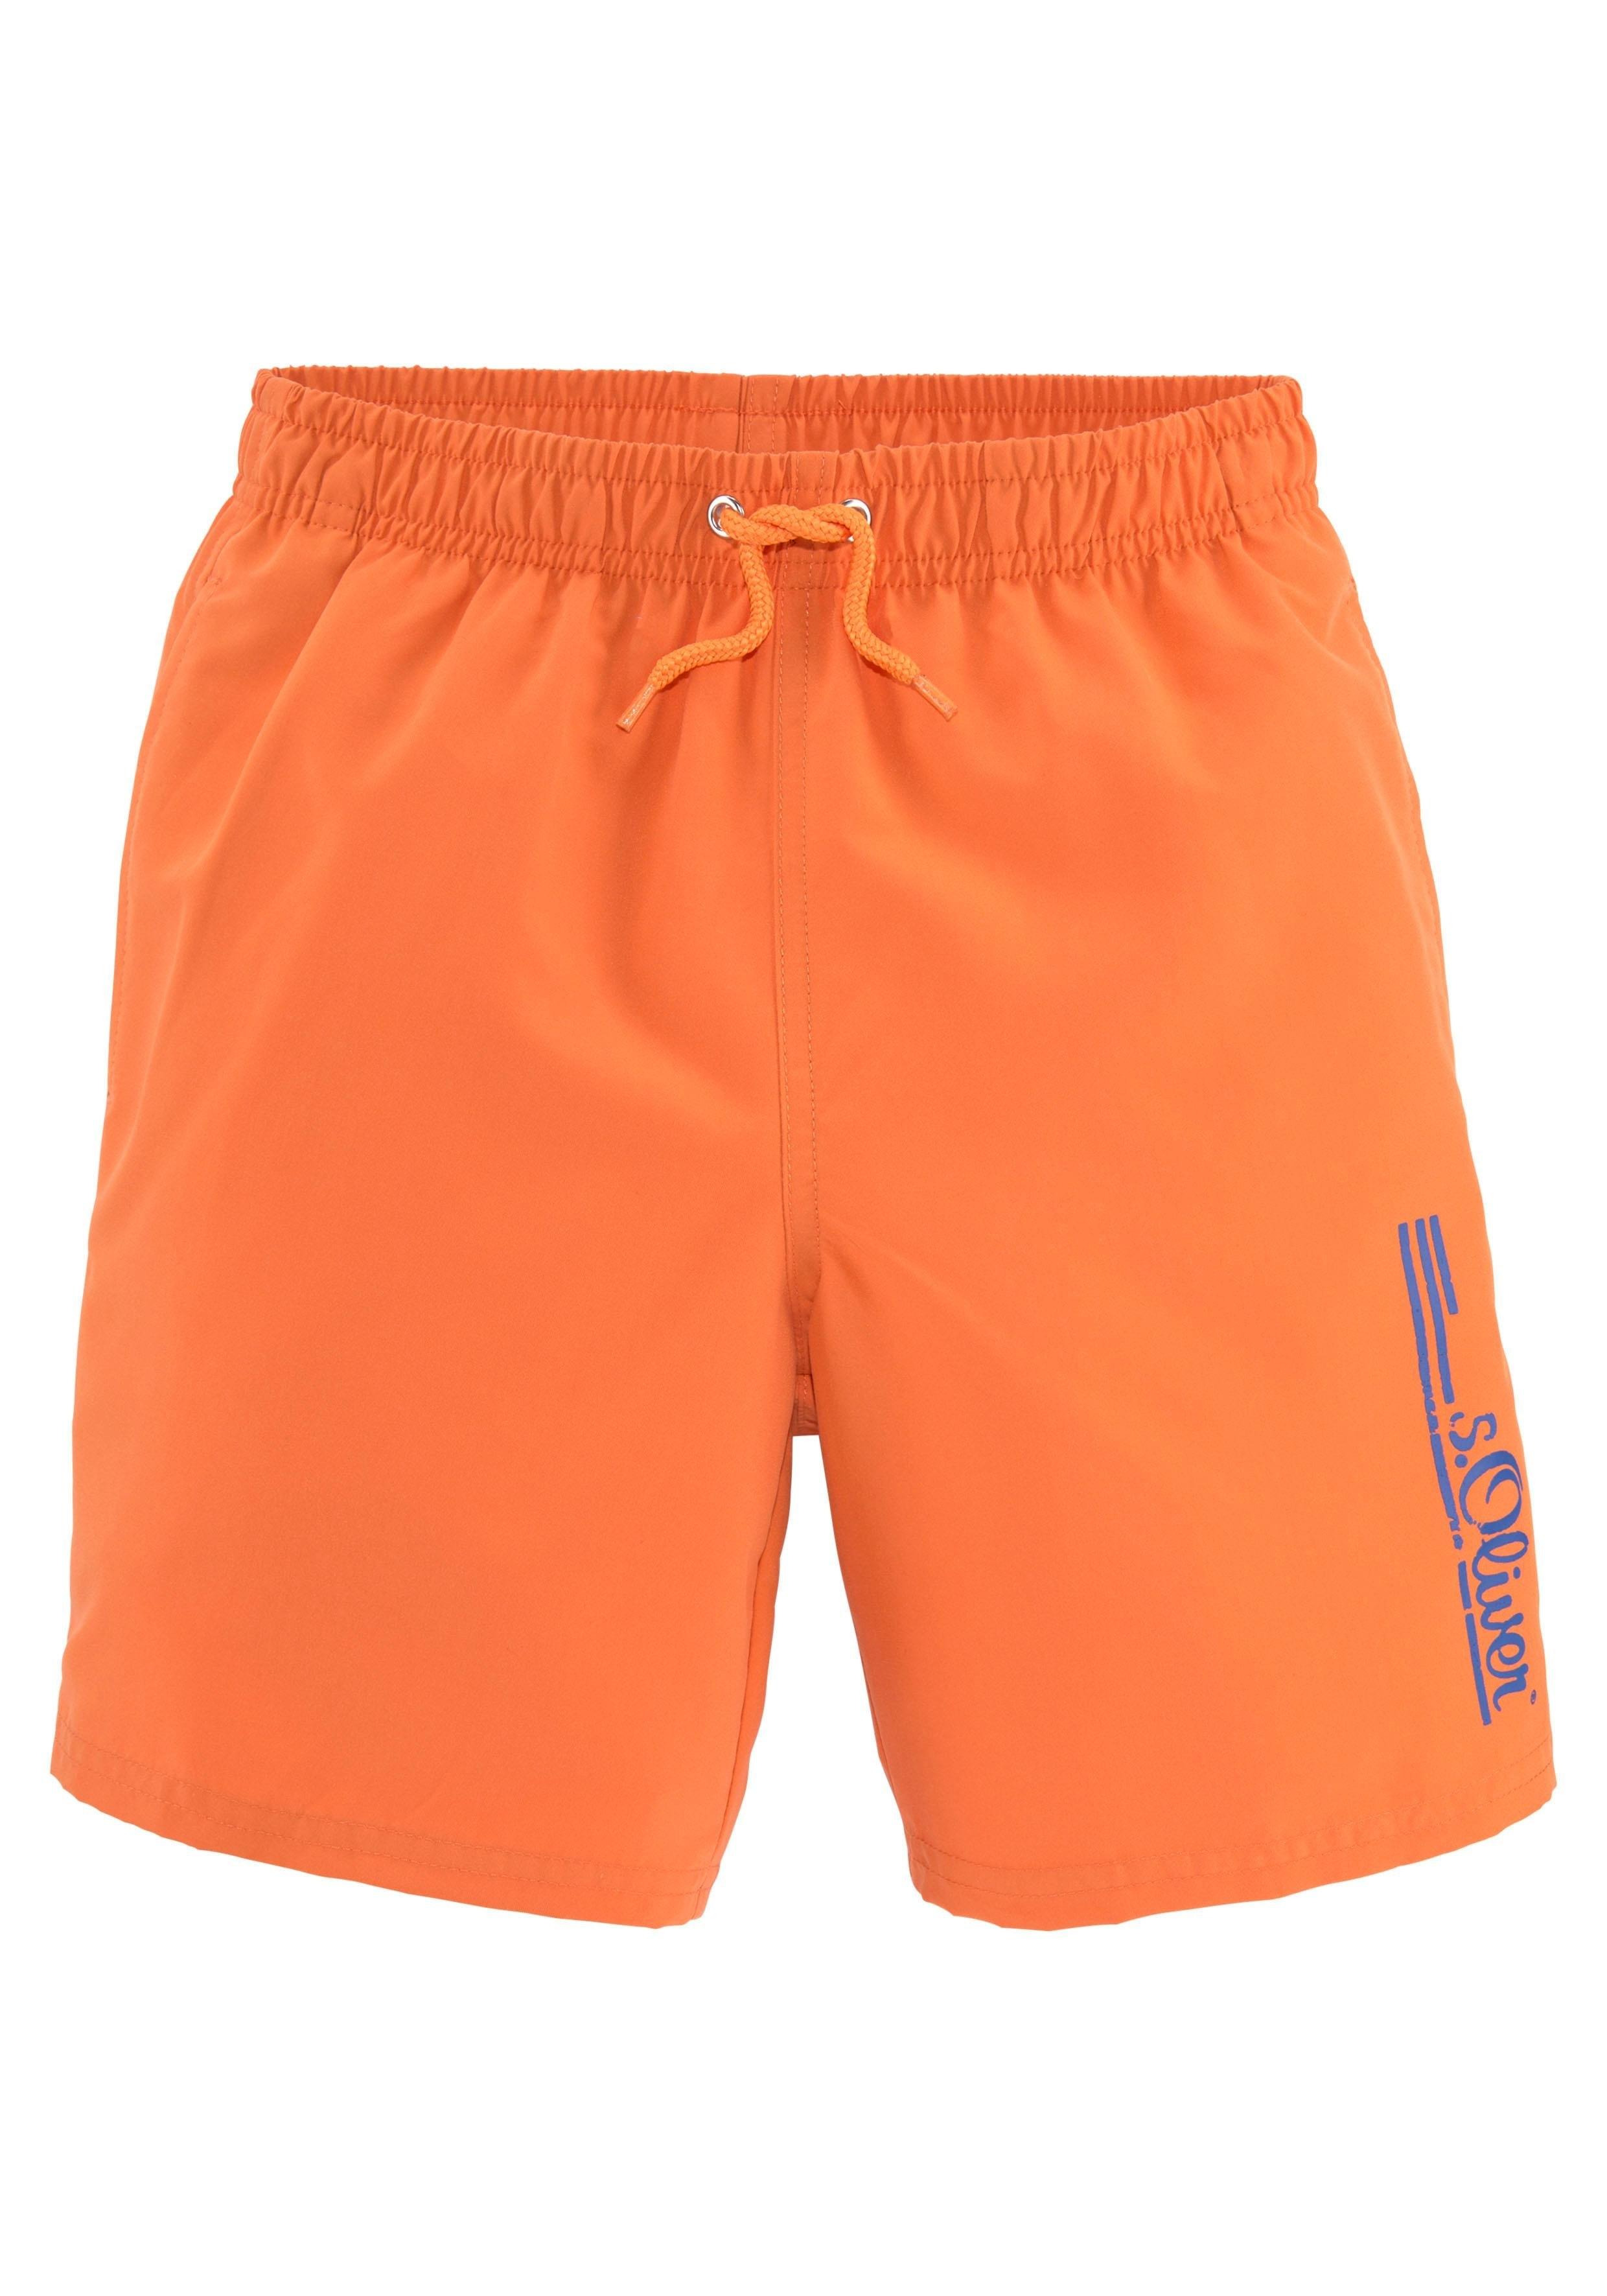 s.Oliver Beachwear s.Oliver RED LABEL Beachwear zwemshort goedkoop op otto.nl kopen